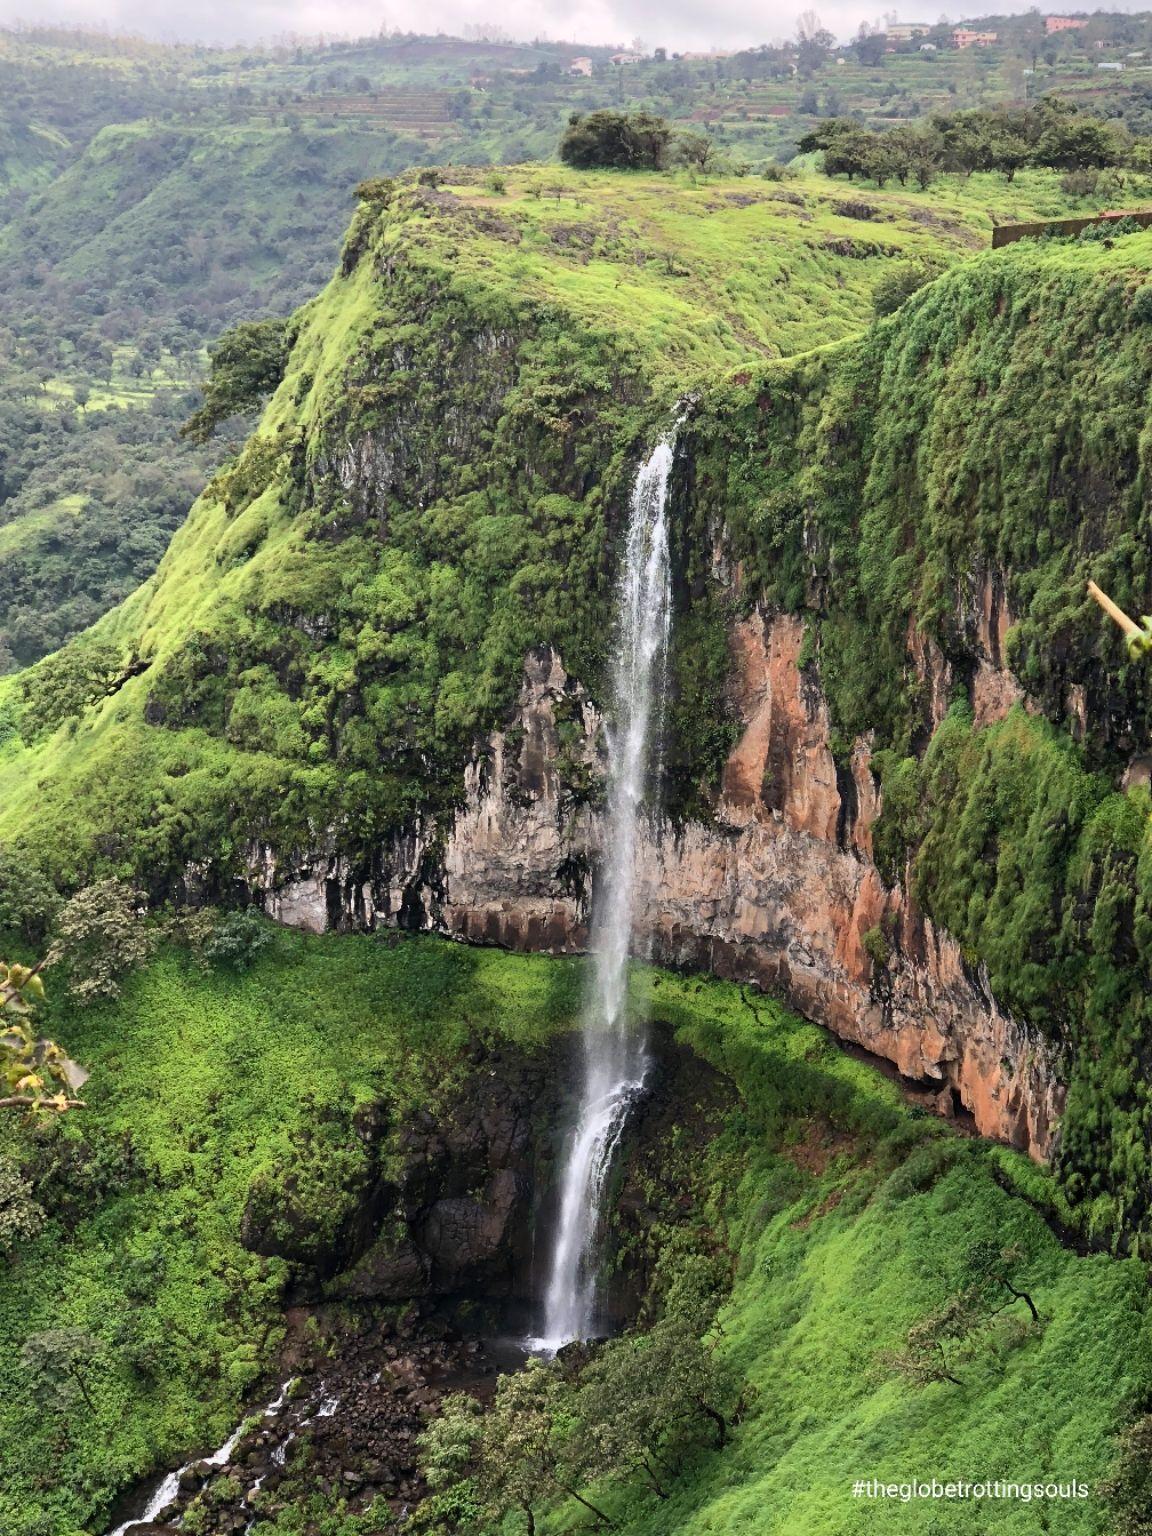 Photo of Chinaman Waterfall By The Globetrotting Souls